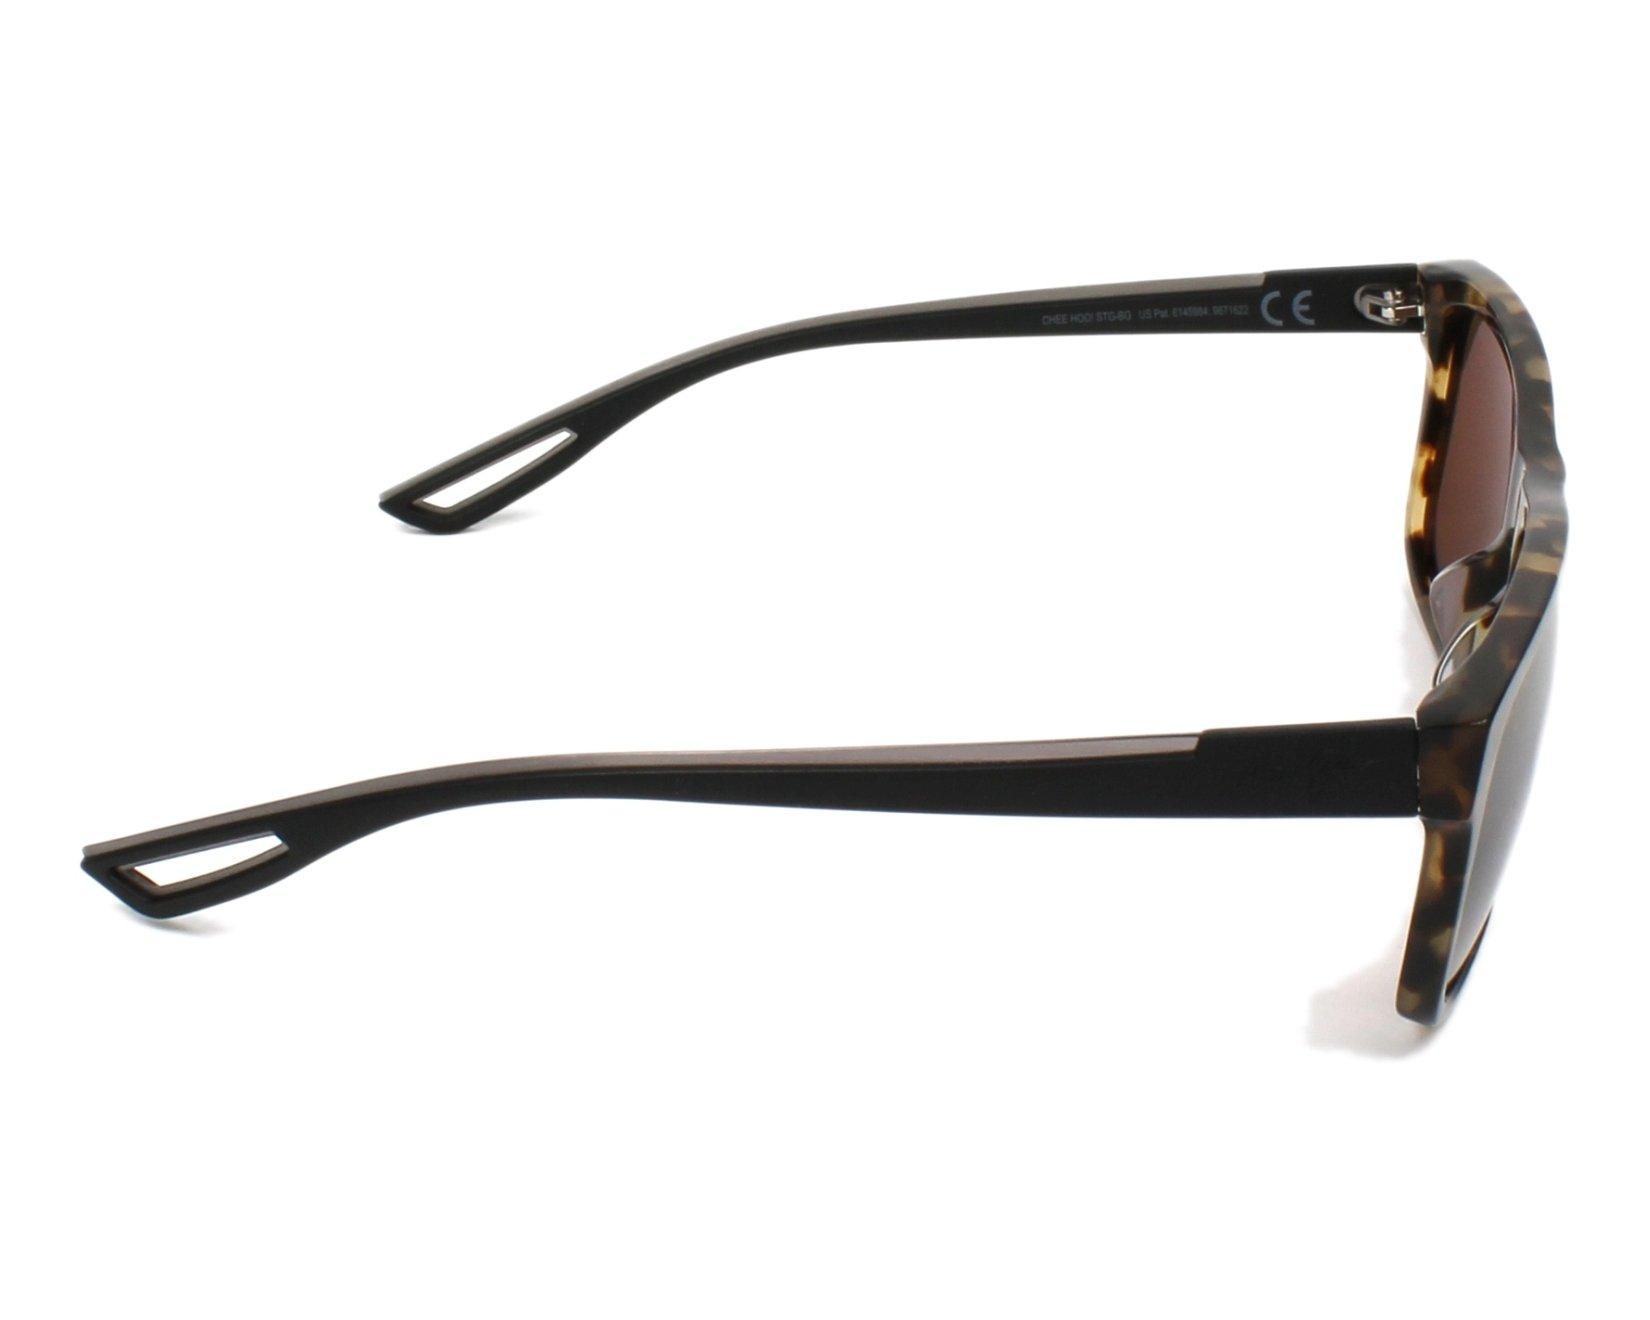 d078e9fe720ef Sunglasses Maui Jim H-765 10L 54-18 Havana Black side view